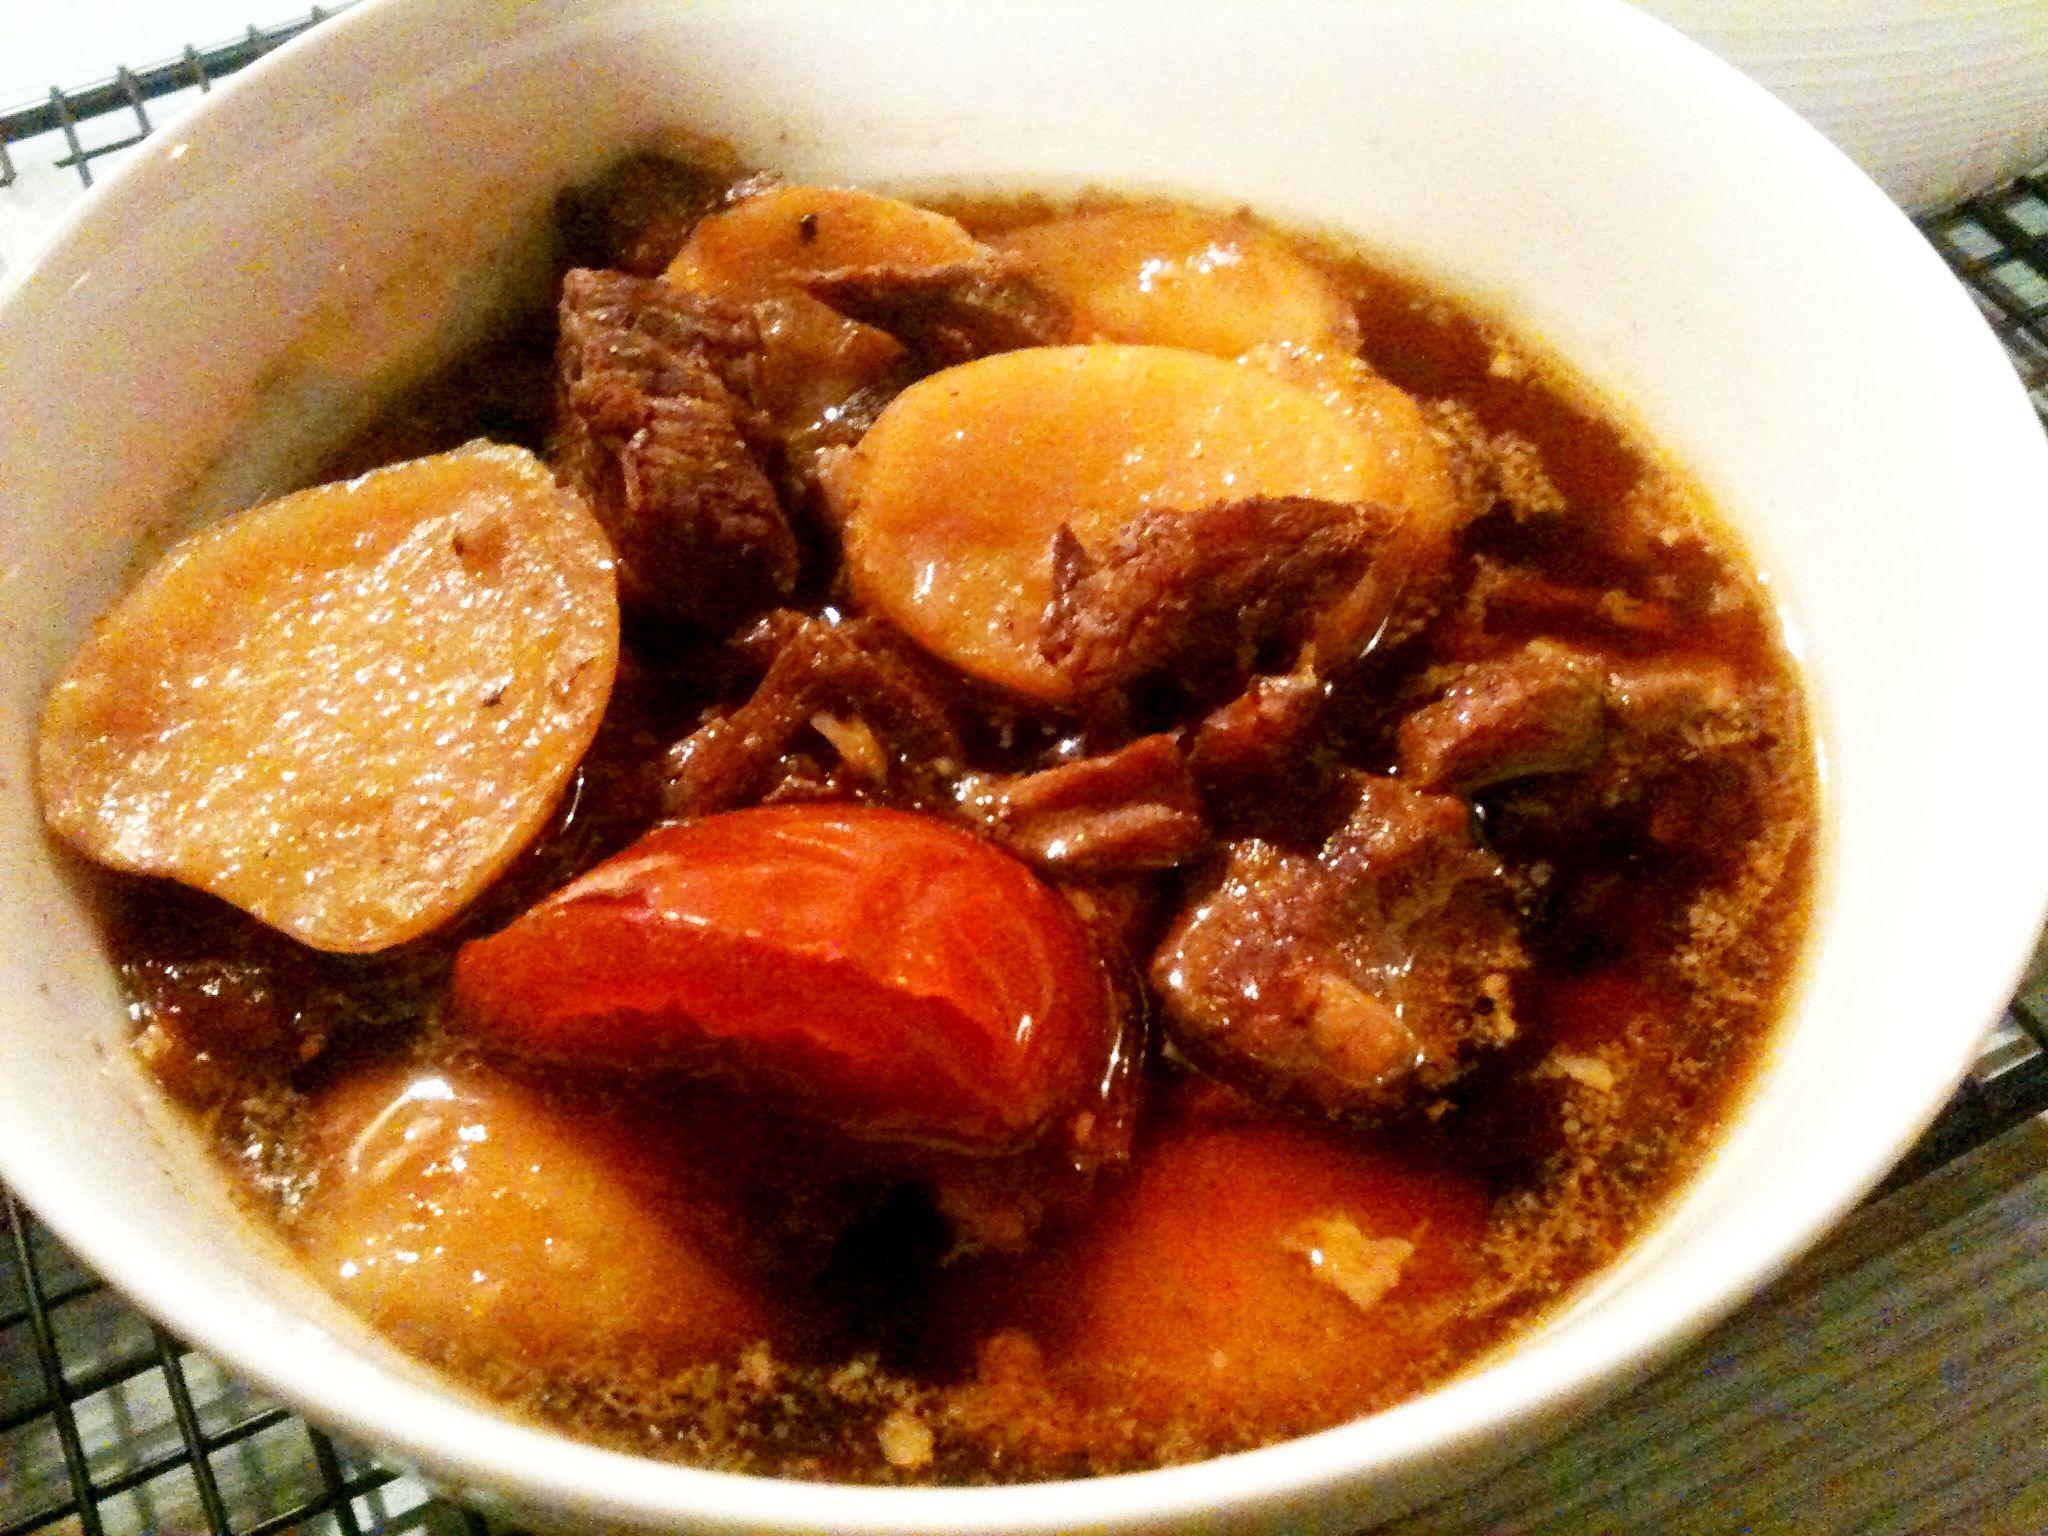 Resep Recipe Bumbu Sajian Sedap Semur Daging Sapi Dan Kentang Kecap Spesial Yang Enak Dan Sederhana Semur Daging Kentang Goreng Resep Masakan Asia